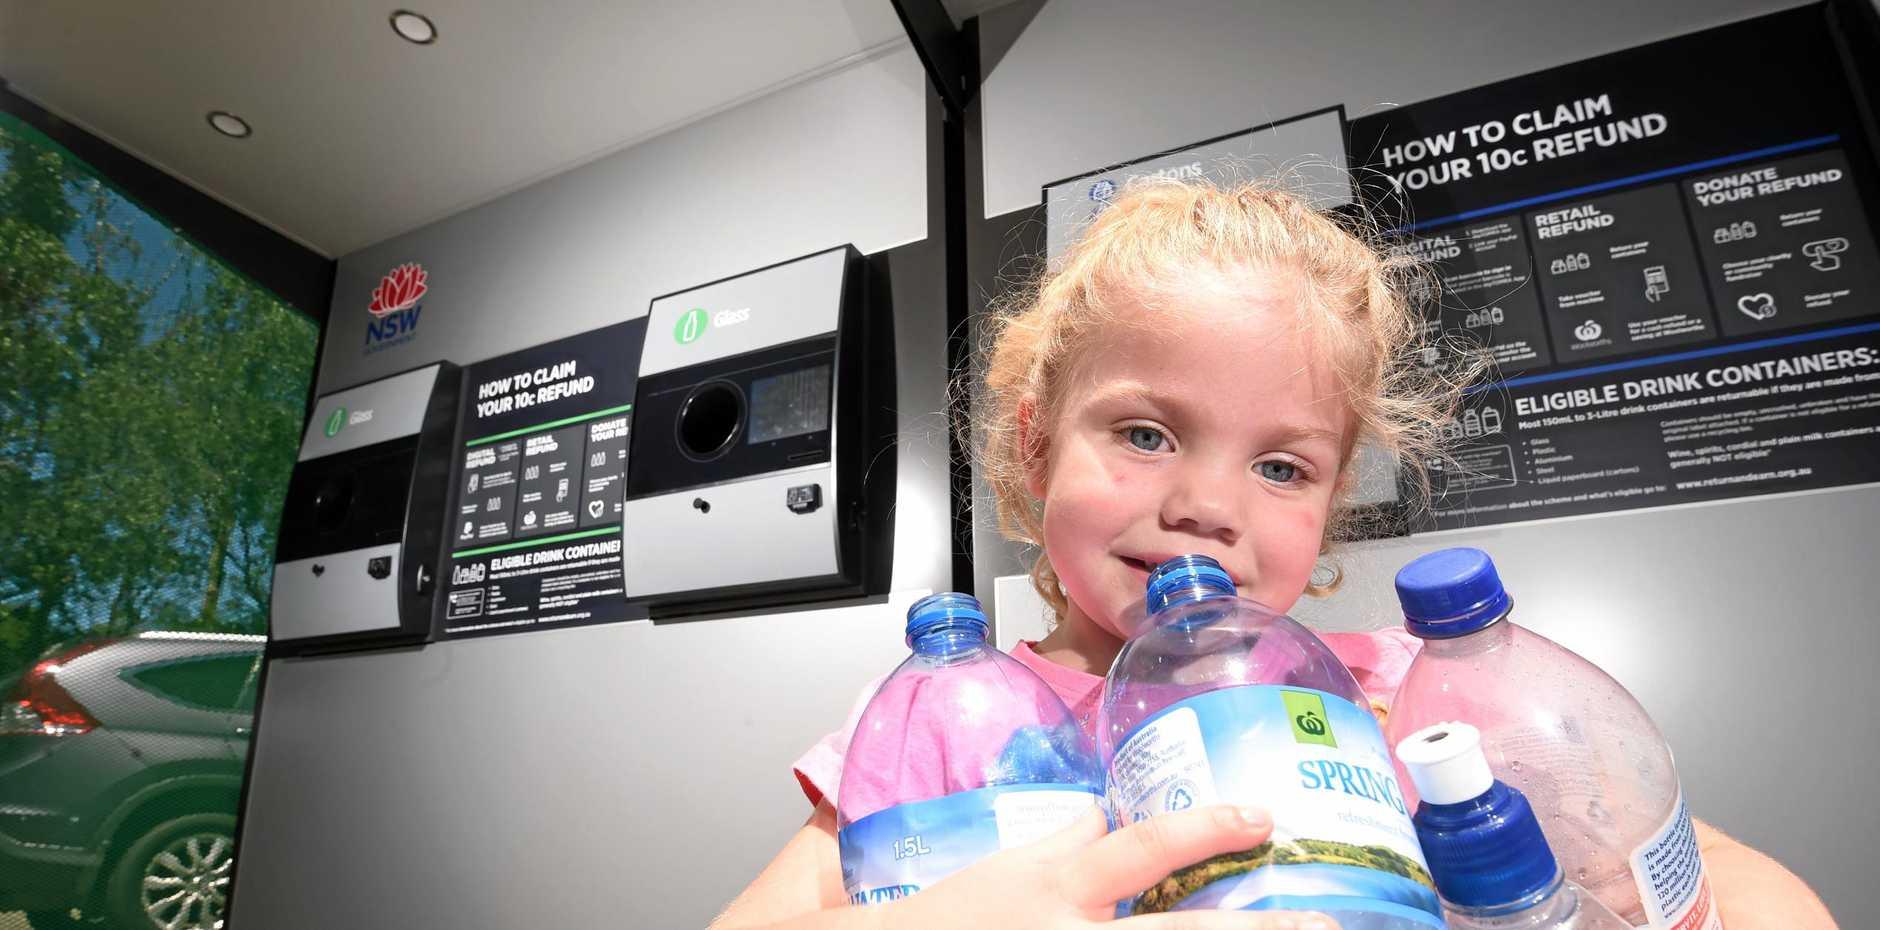 RECYCLE: Return plastic bottles  in order to raise money .